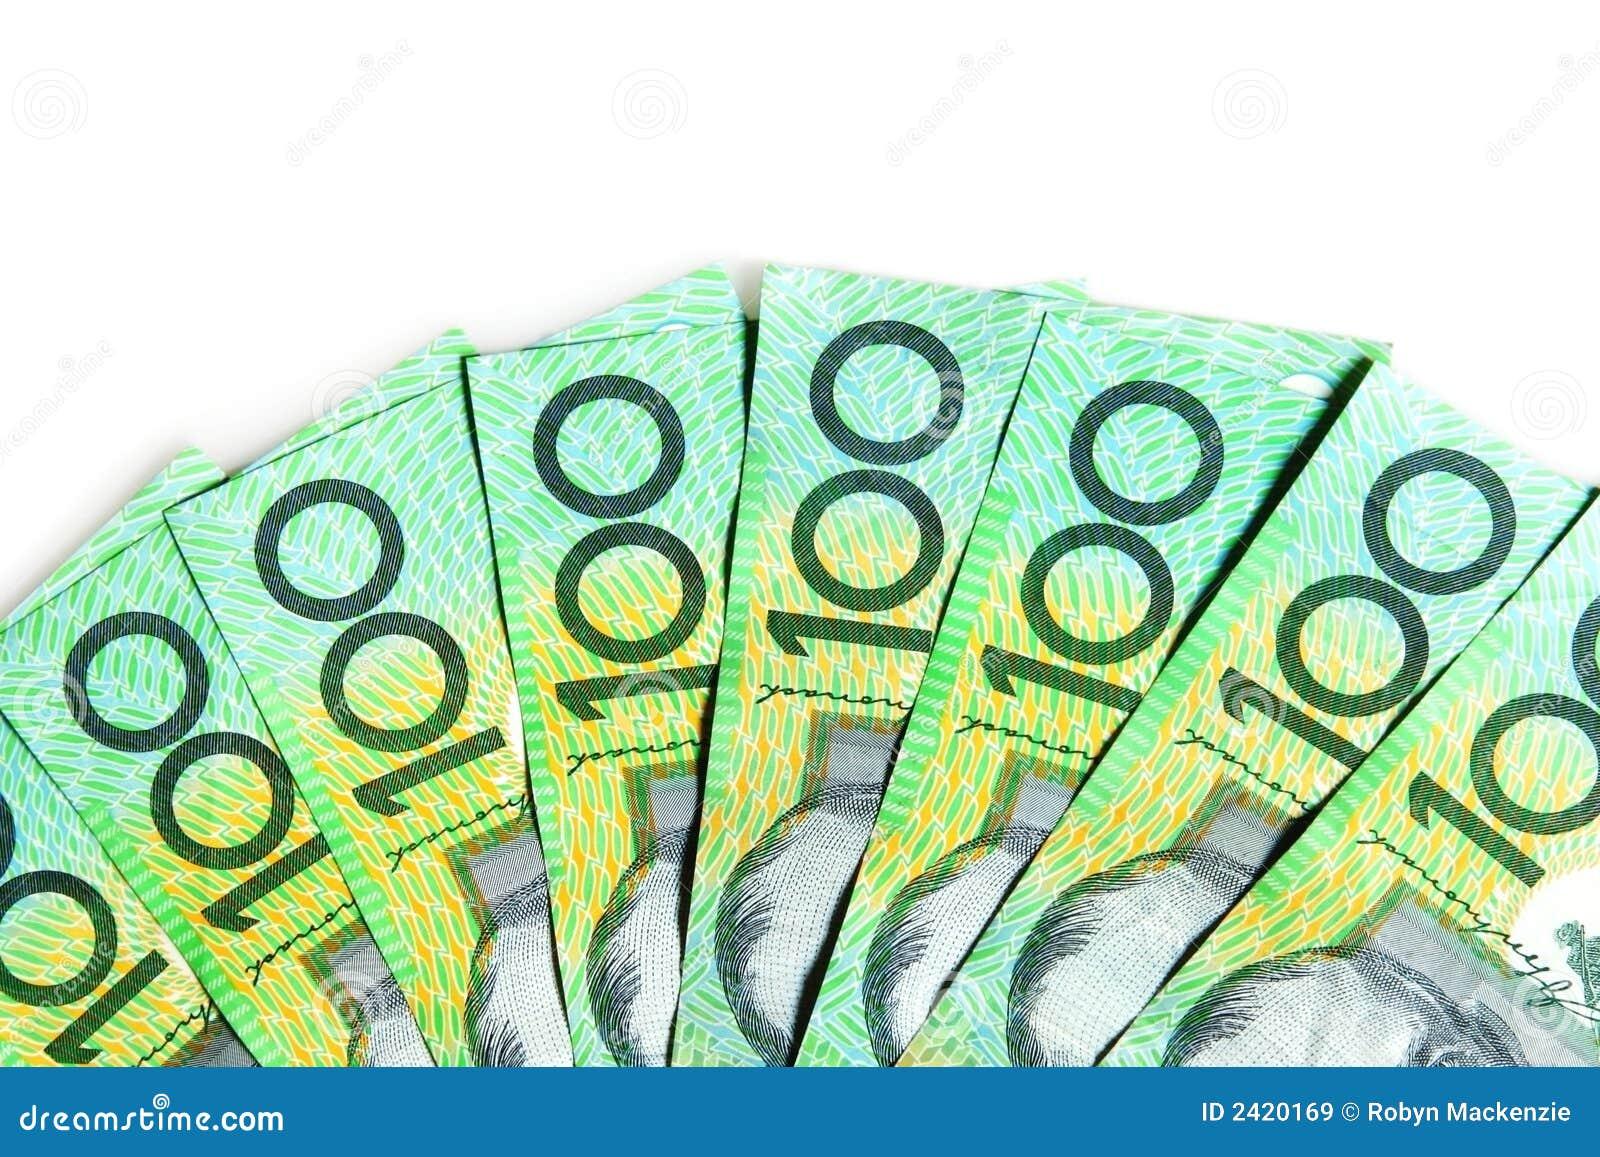 Australian $100 Bills Royalty Free Stock Images - Image ...